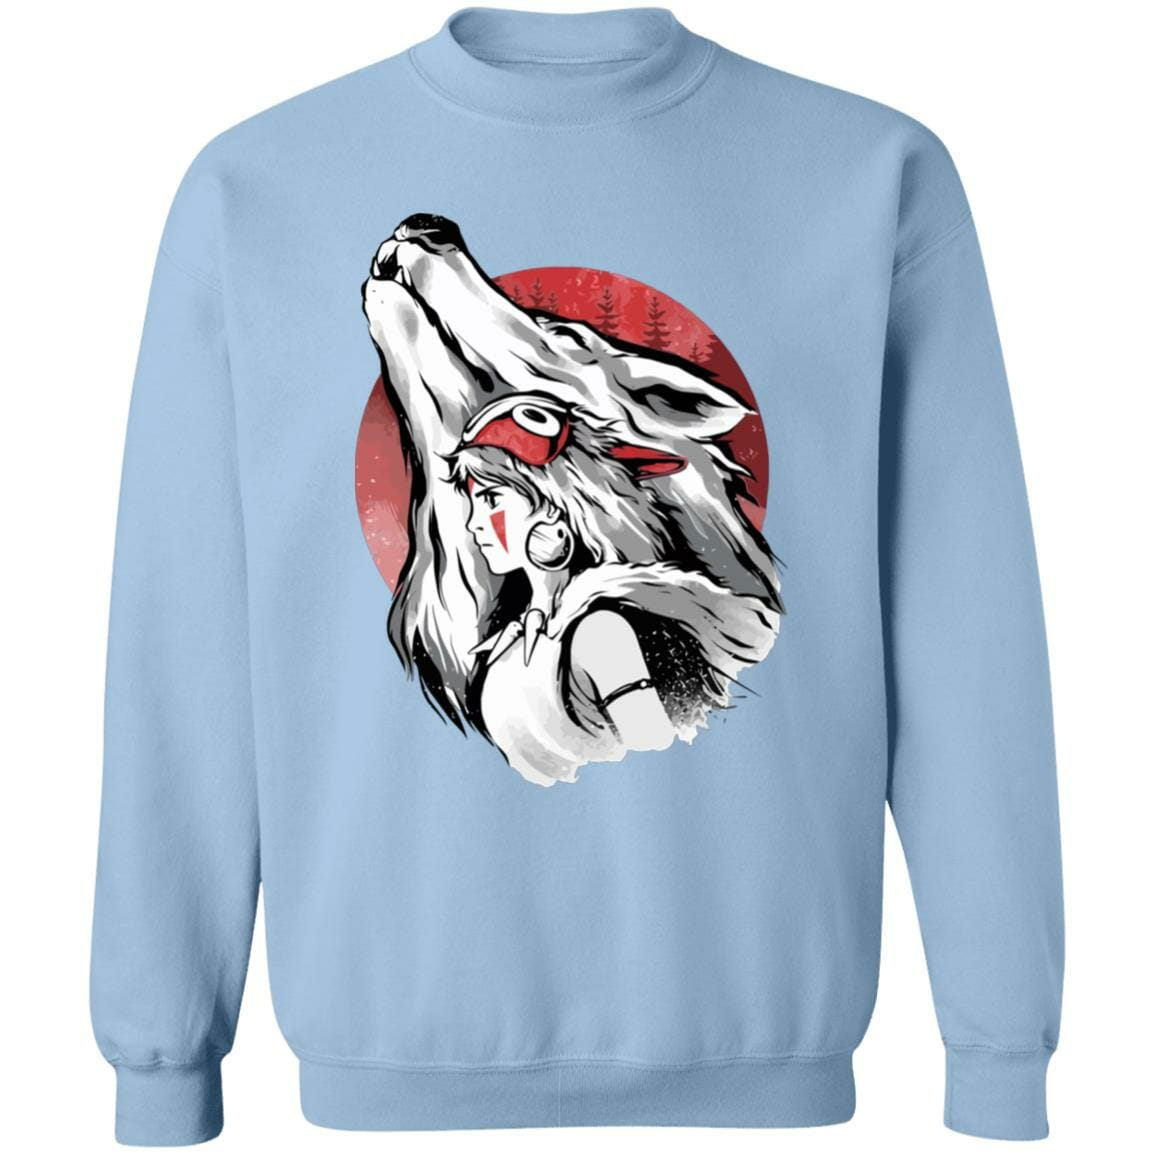 Princess Mononoke – Red Moon Sweatshirt